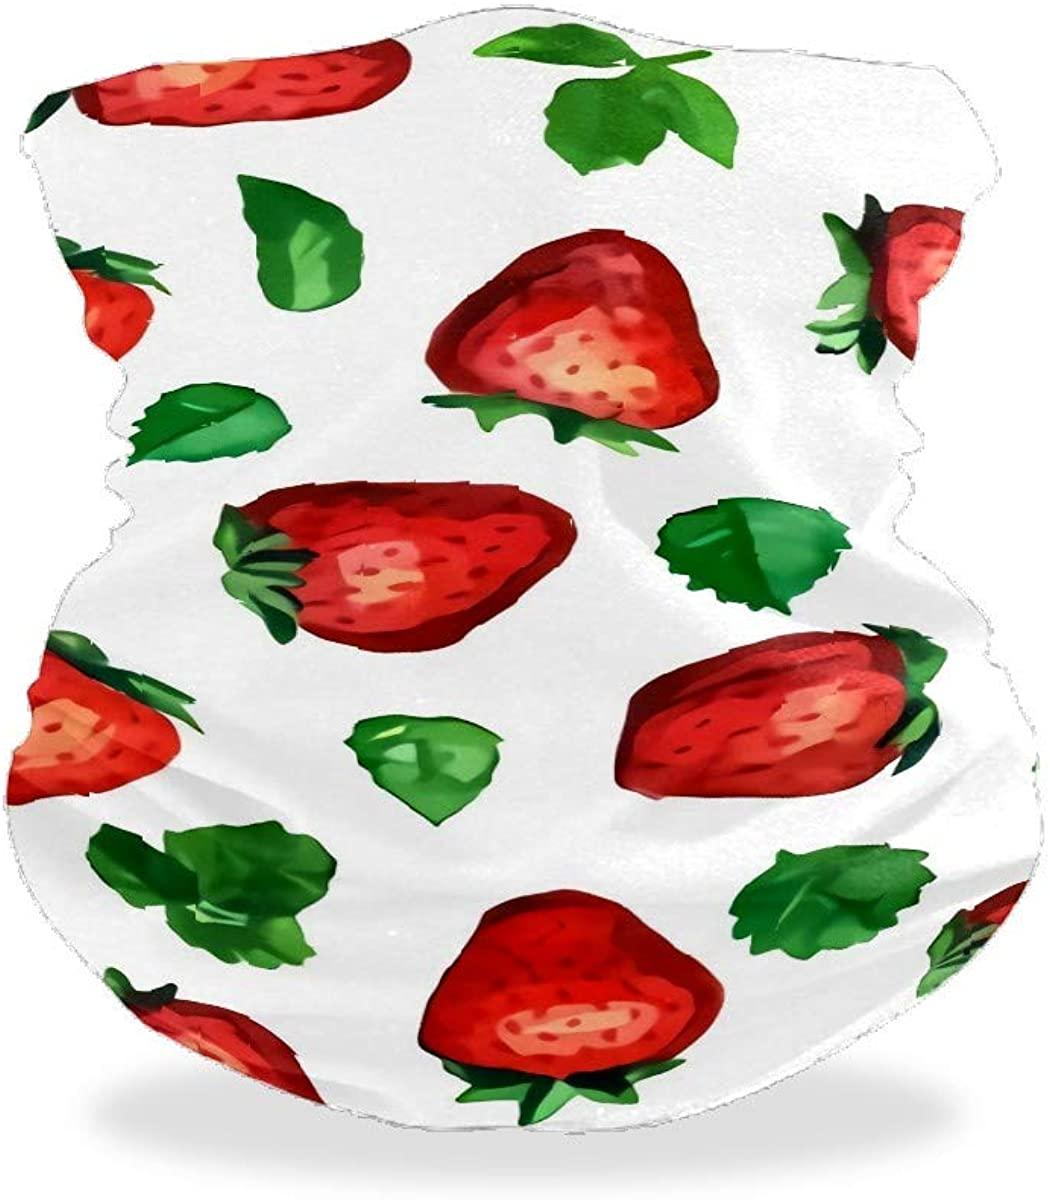 J.COXLOD Face Scarf Neck Gaiter, Adjustable Reusable Bandana, Sun UV Protection Cool Lightweight Face Cover for Women& Men Fruit Printed